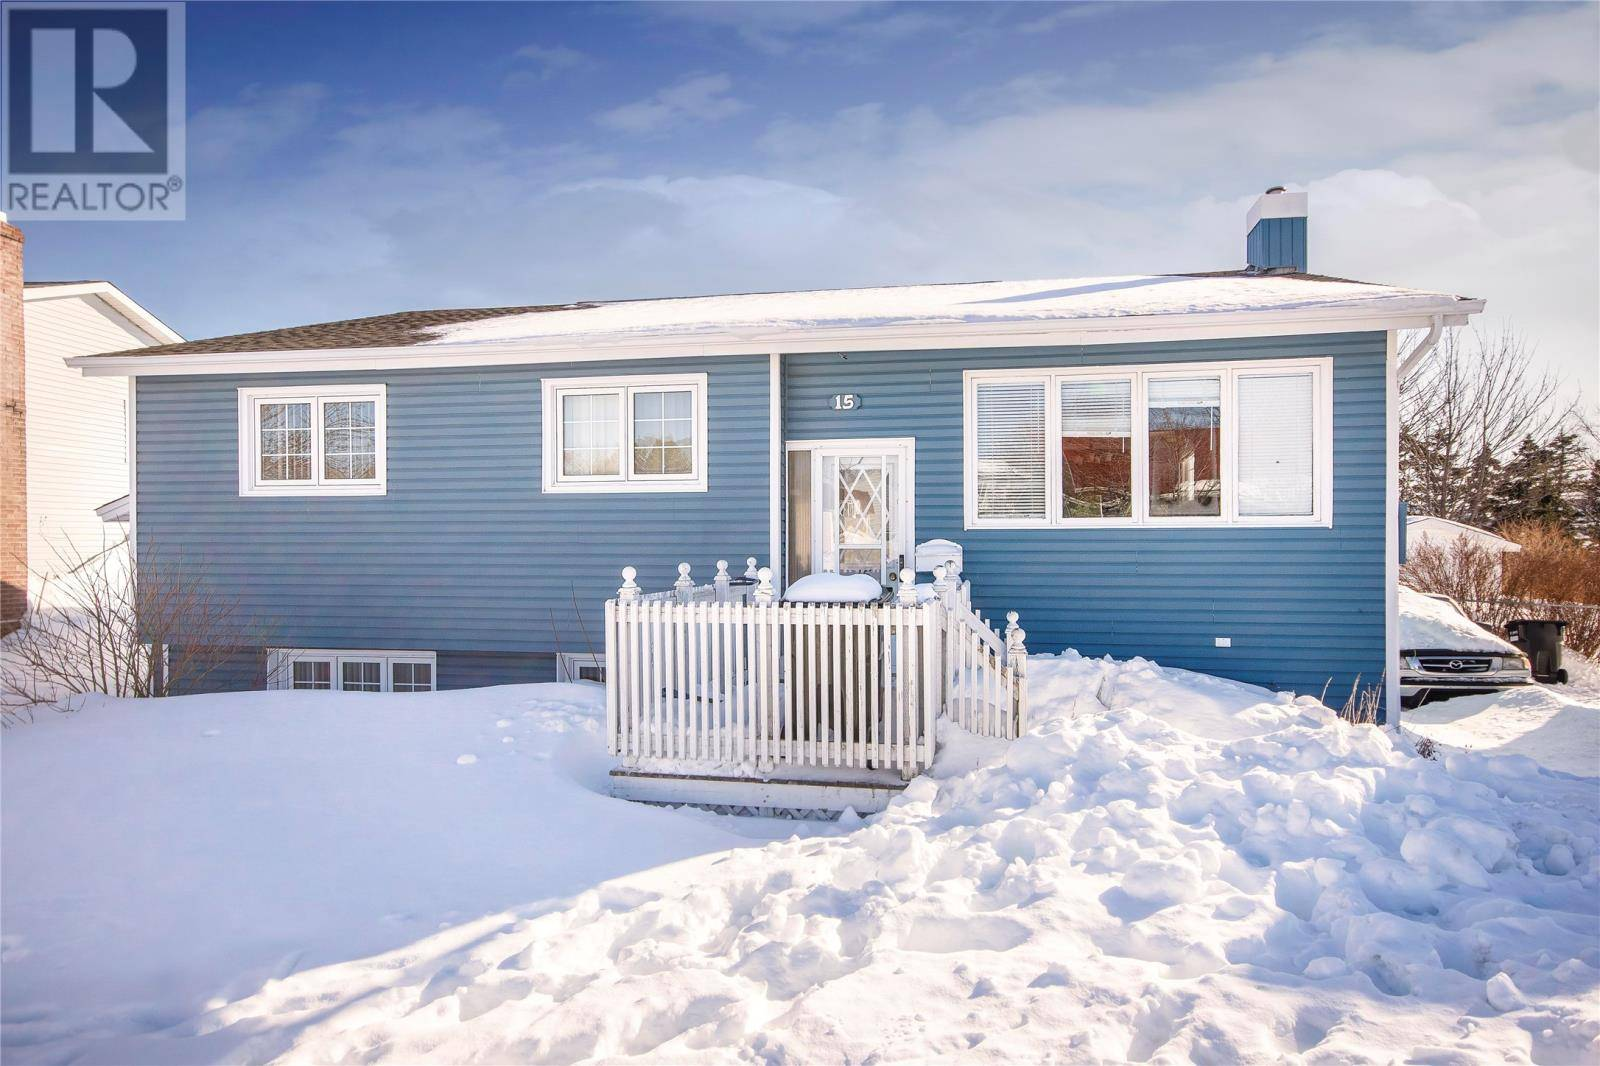 House for sale at 15 Virginia Pl St. John's Newfoundland - MLS: 1209914